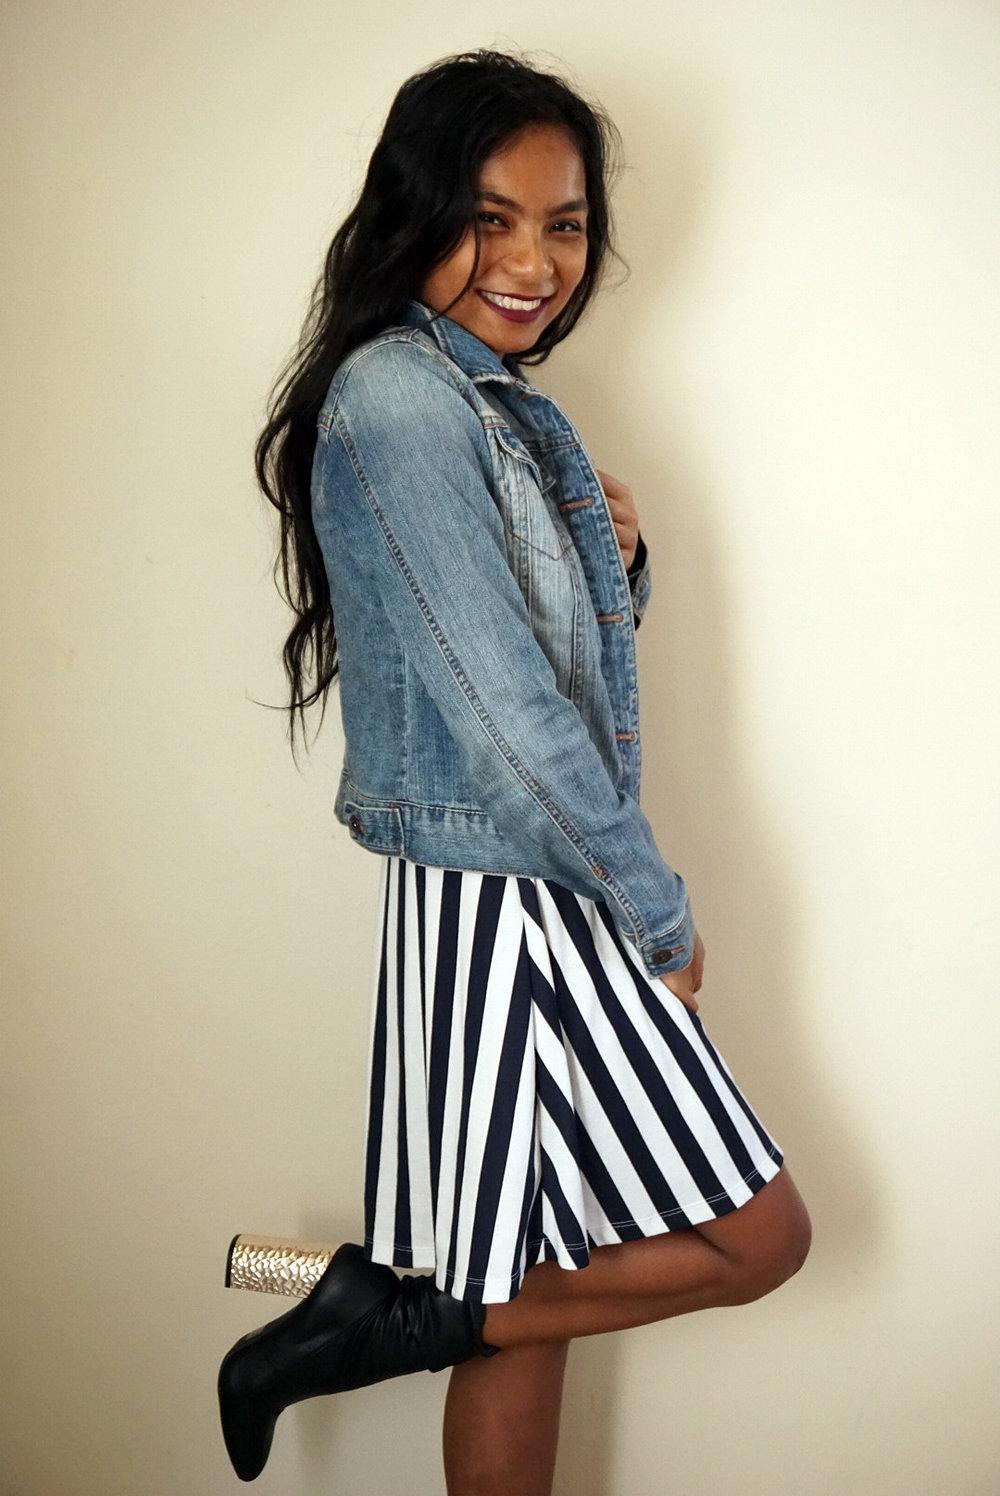 Striped-Dress-Black-Amiclubwear-Boots-Fall-Style-Blogger-LINDATENCHITRAN-2-1616x1080.jpg